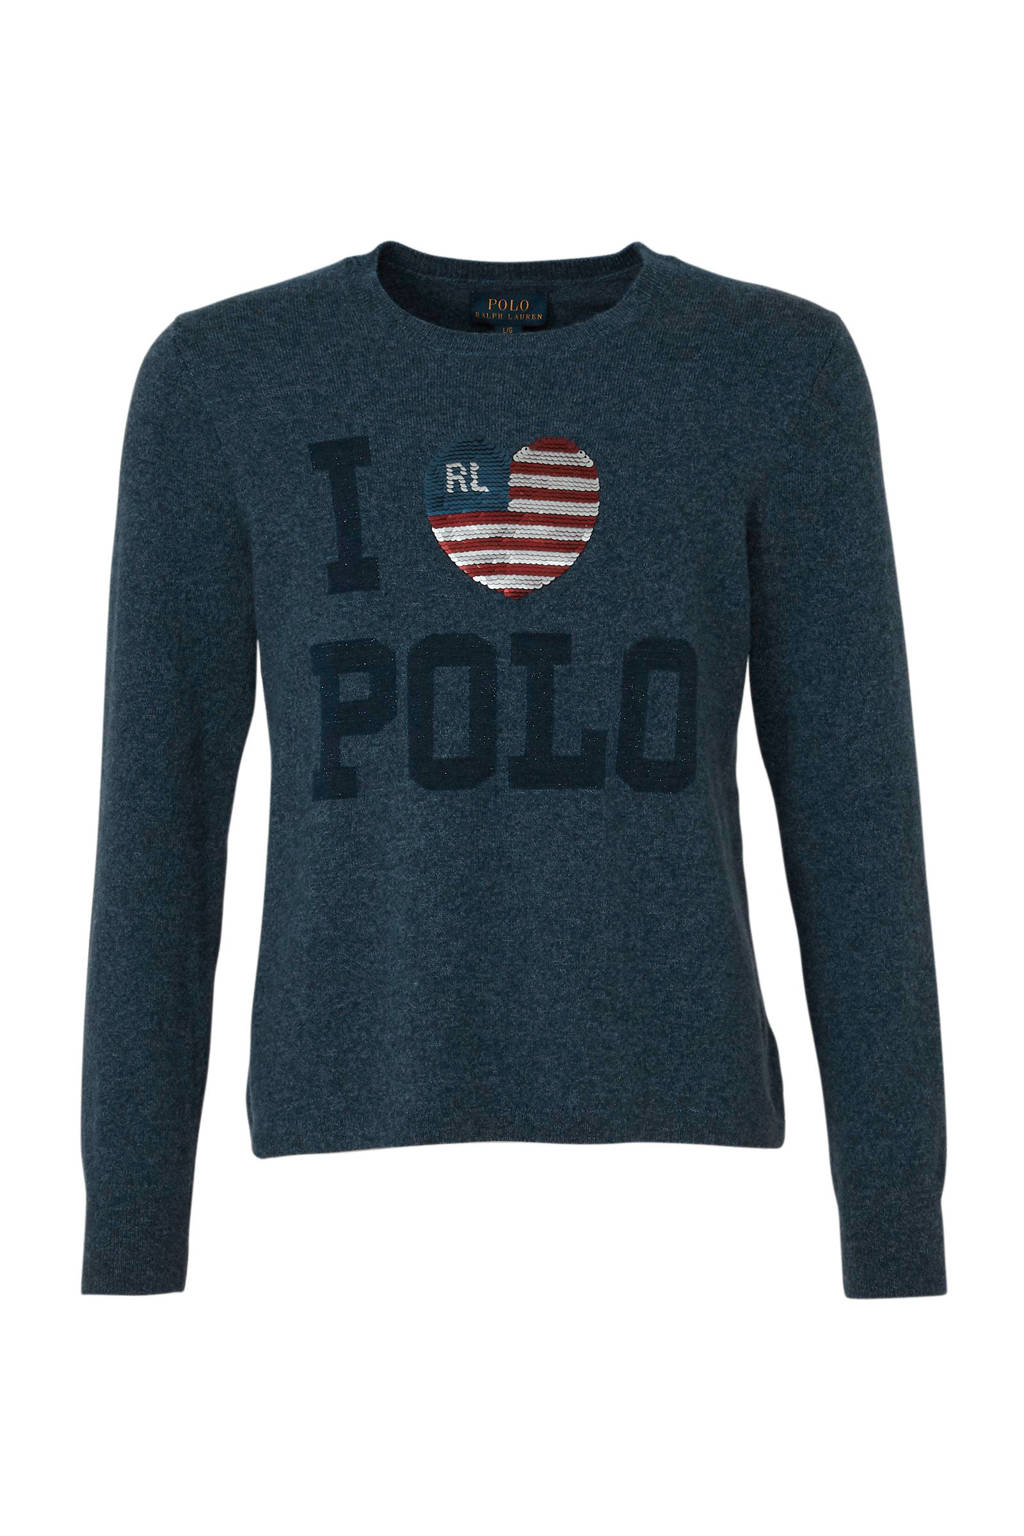 POLO Ralph Lauren trui met wol en logo donkerblauw, Donkerblauw